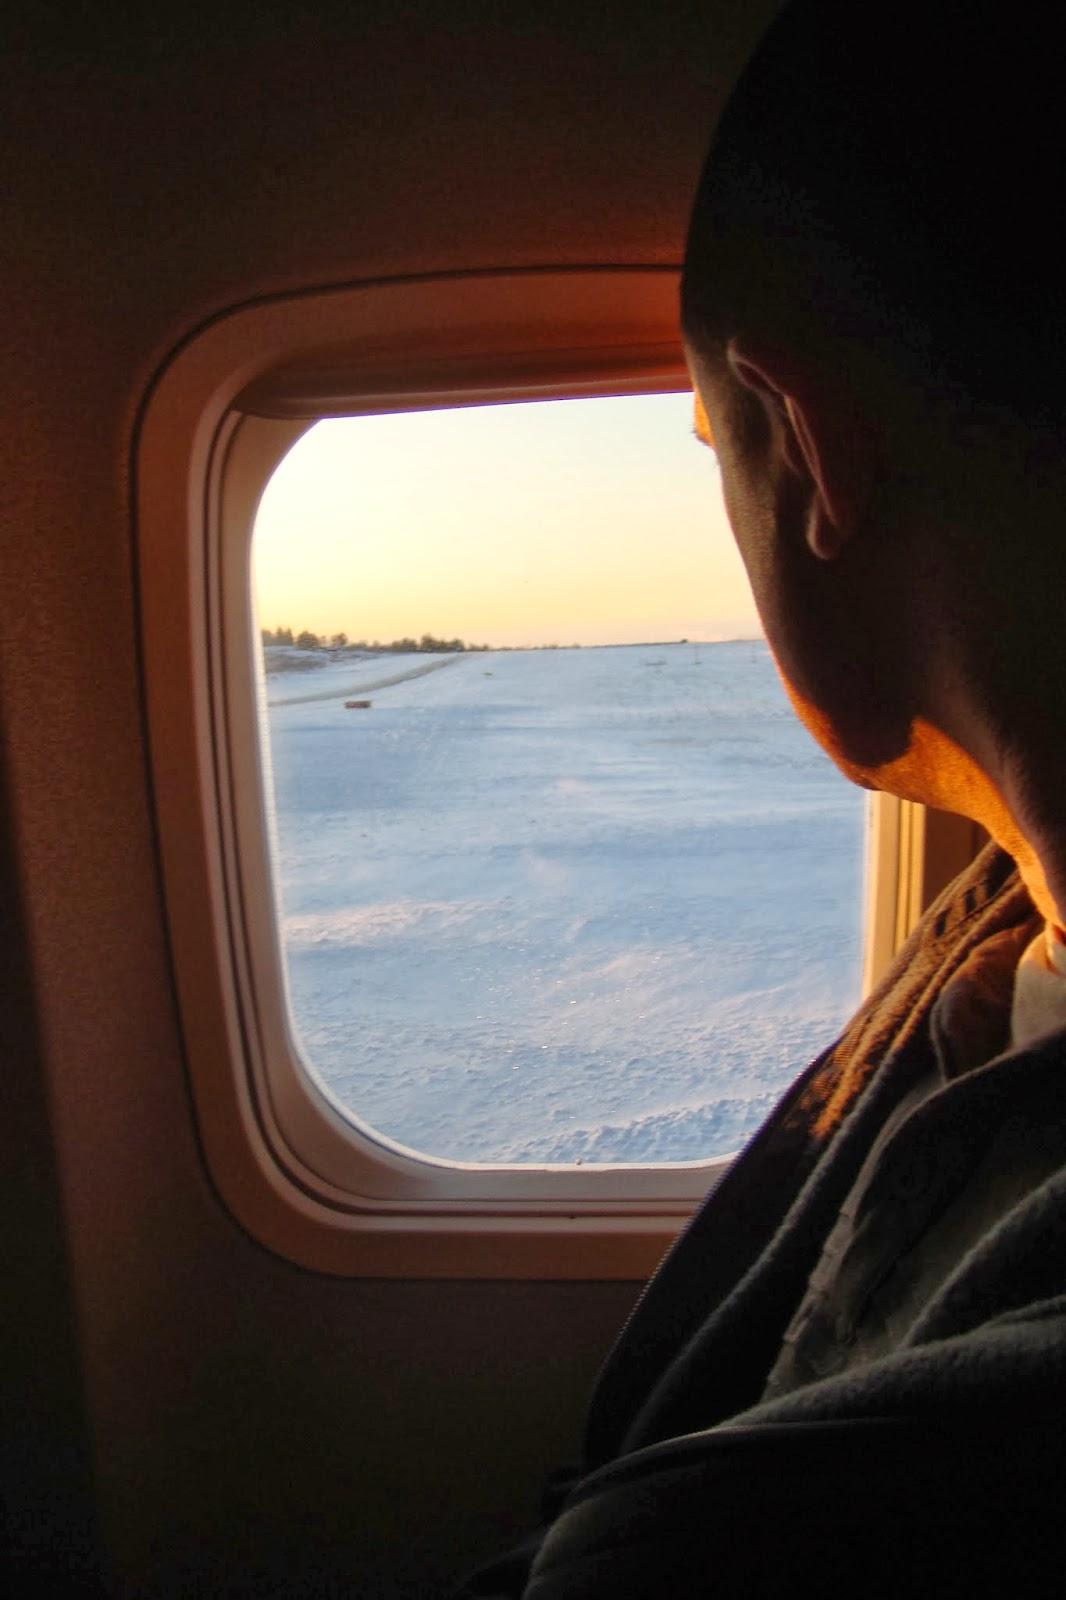 plane window and snow